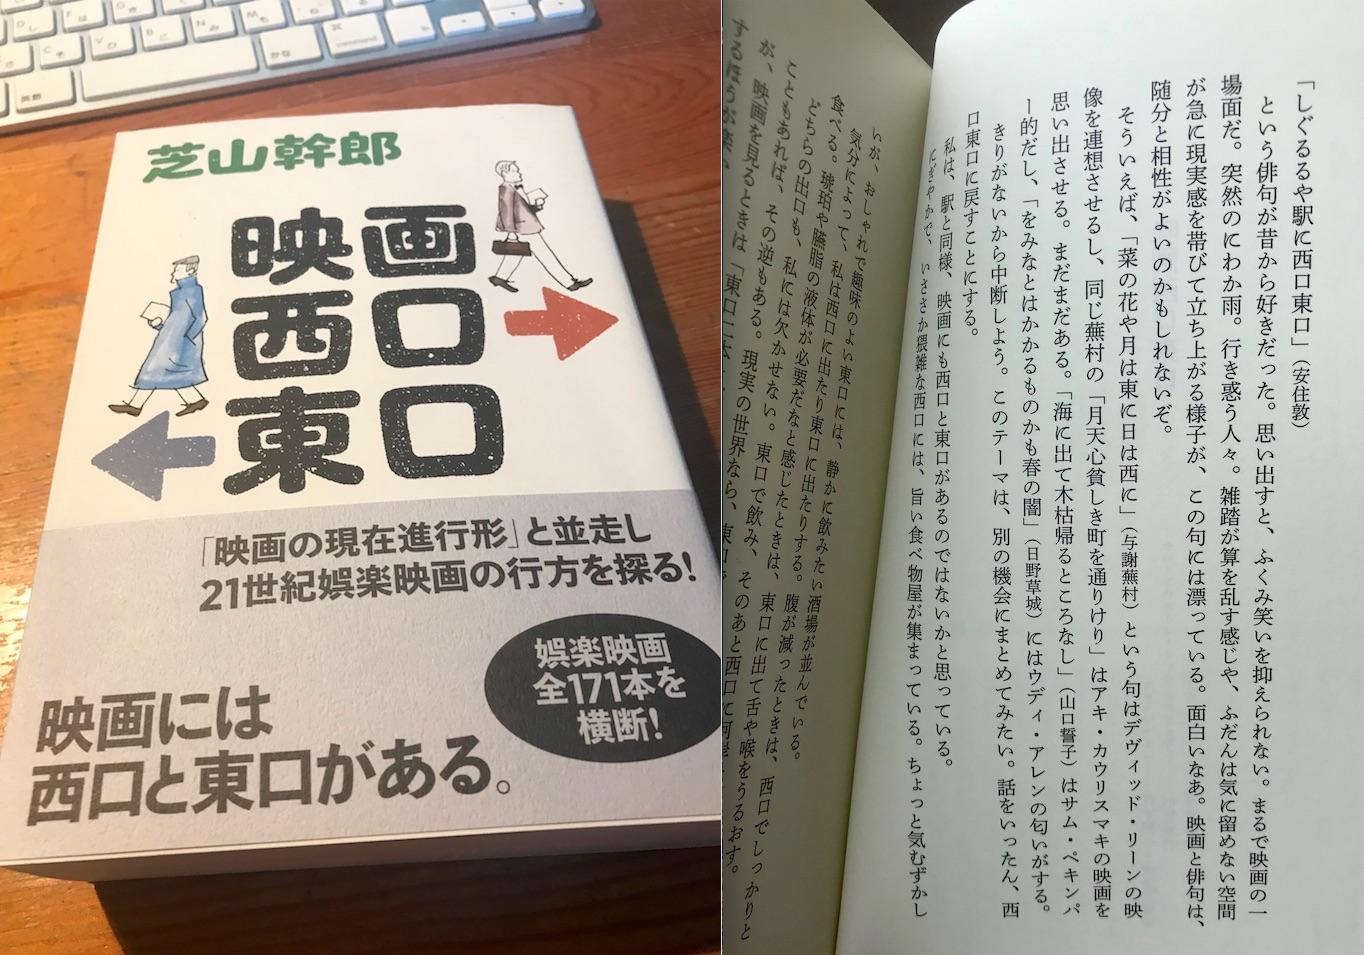 https://cdn-ak.f.st-hatena.com/images/fotolife/s/shioshiohida/20190204/20190204135049_original.jpg